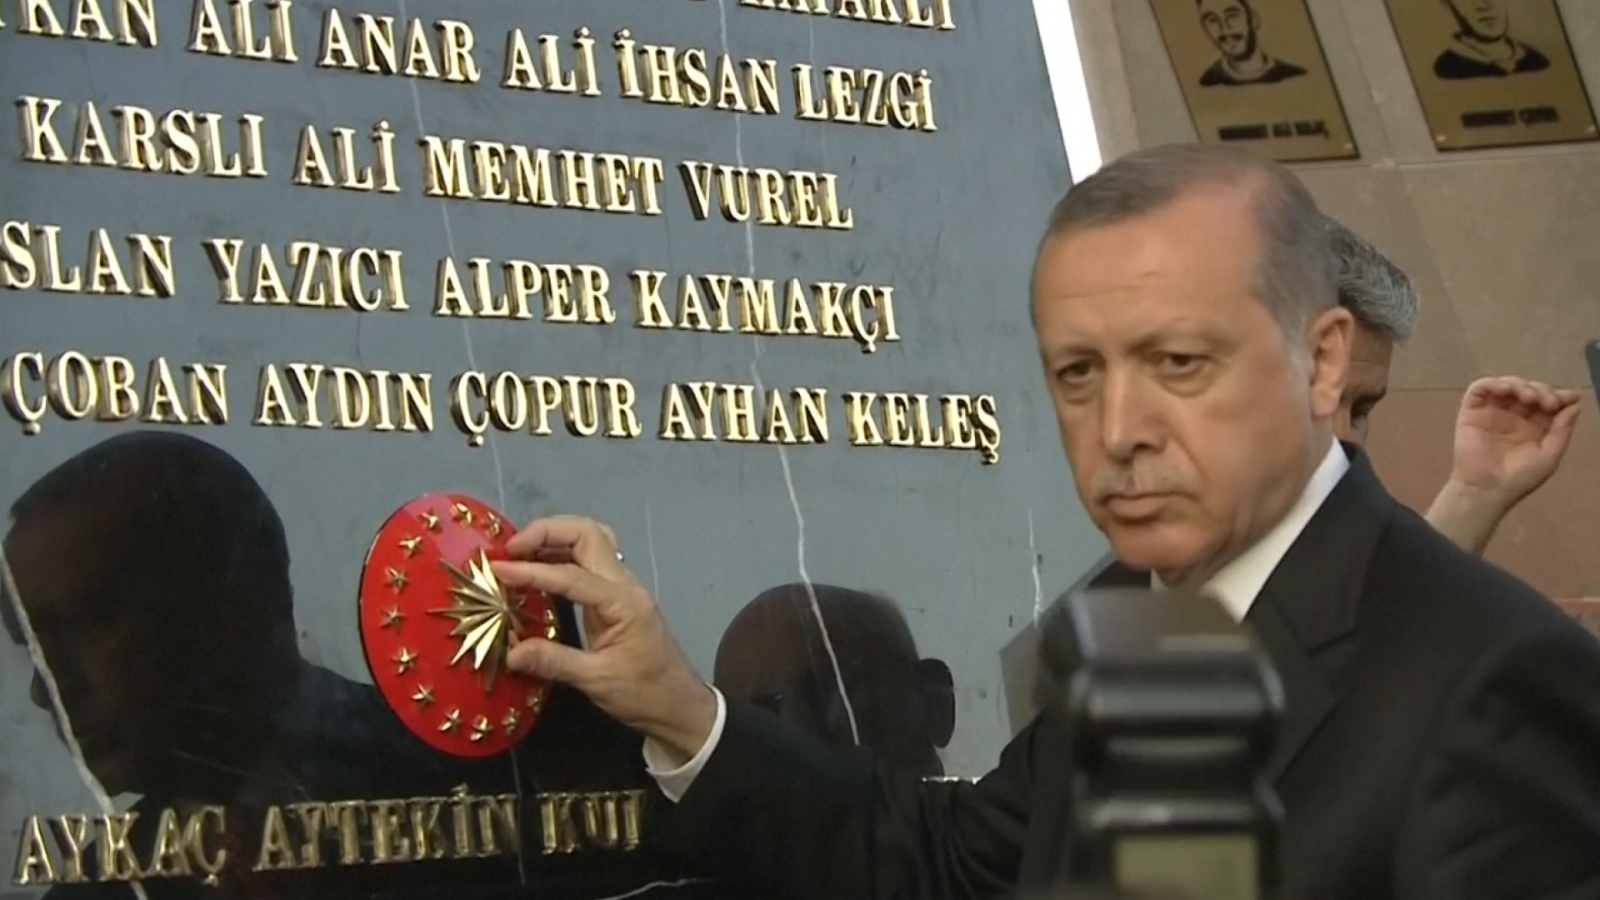 turkeys-erdogan-addresses-rallies-to-mark-first-anniversary-of-failed-coup